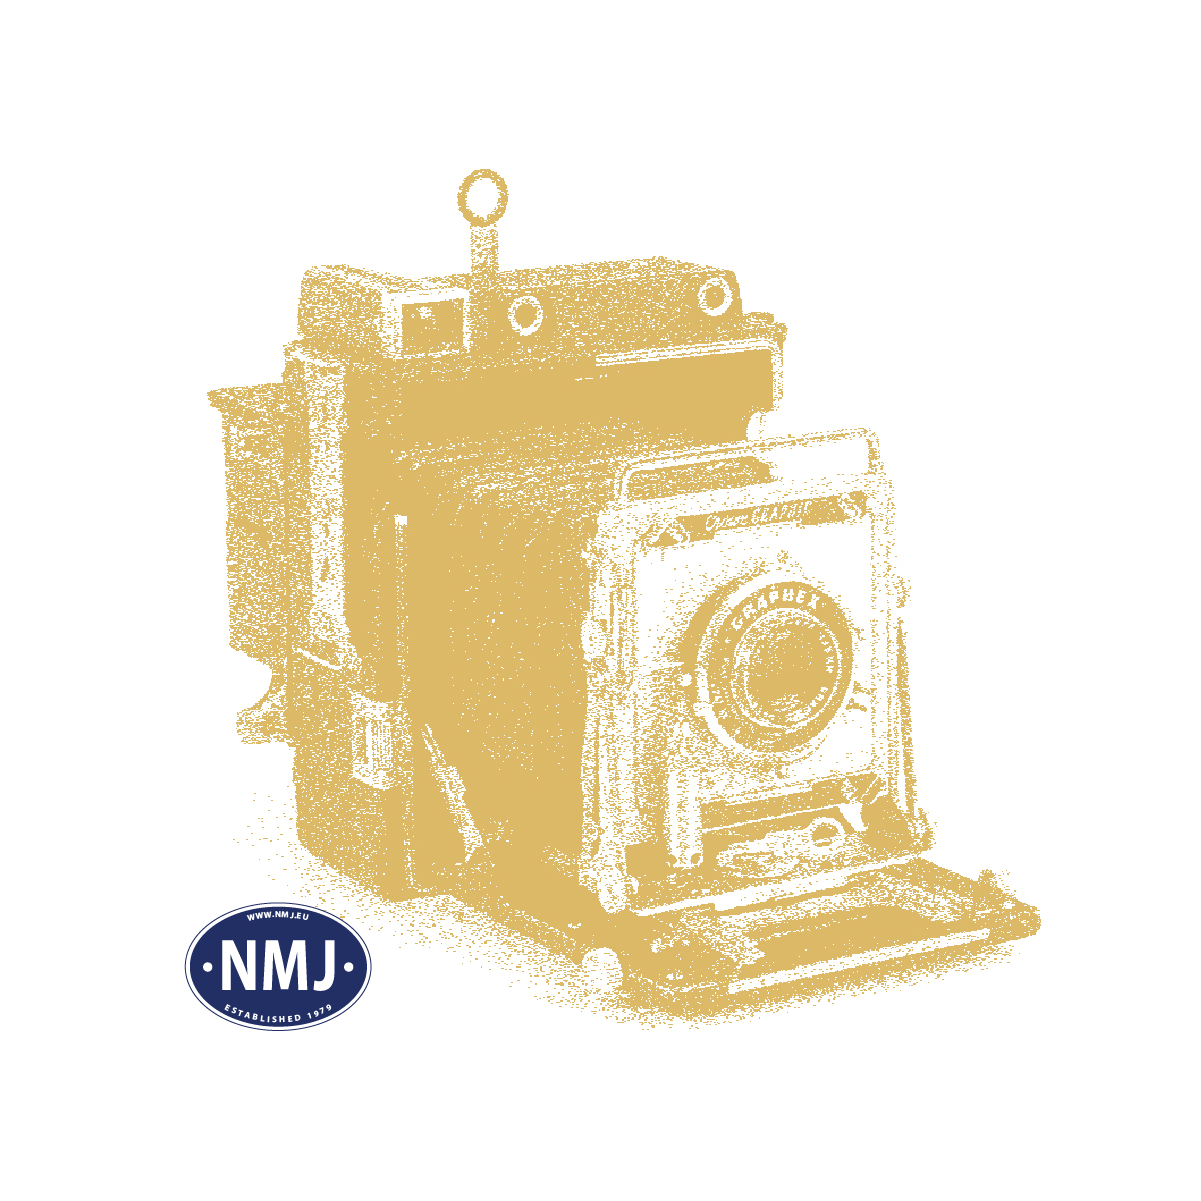 NMJTKAT17 - NMJ Katalogpakke 2017, NMJ Superline, Topline og Skyline